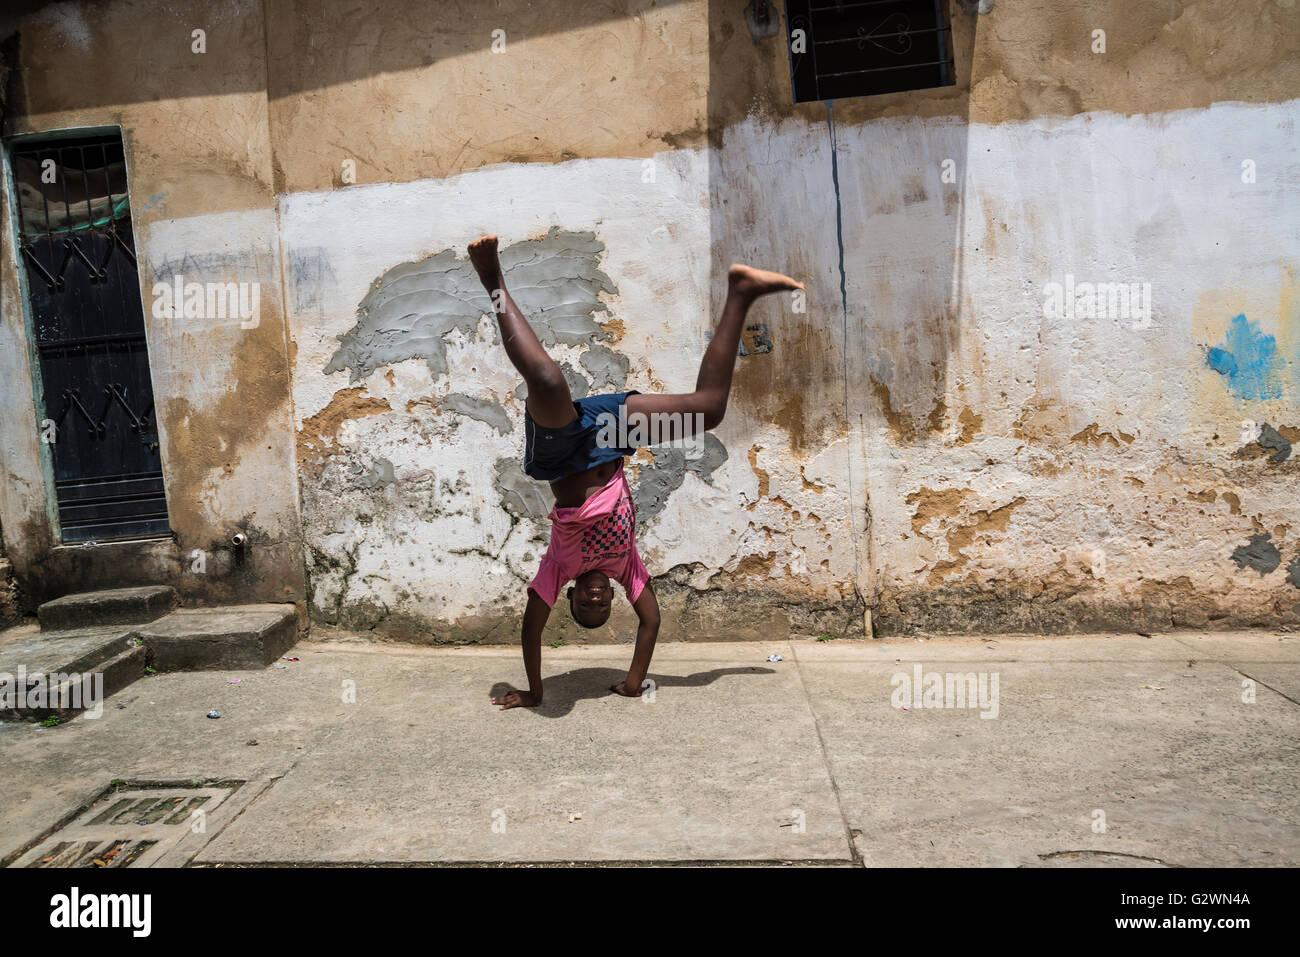 Chico, Salvador, Bahia, Brasil, pino, favela, pobreza, jugando solo Imagen De Stock